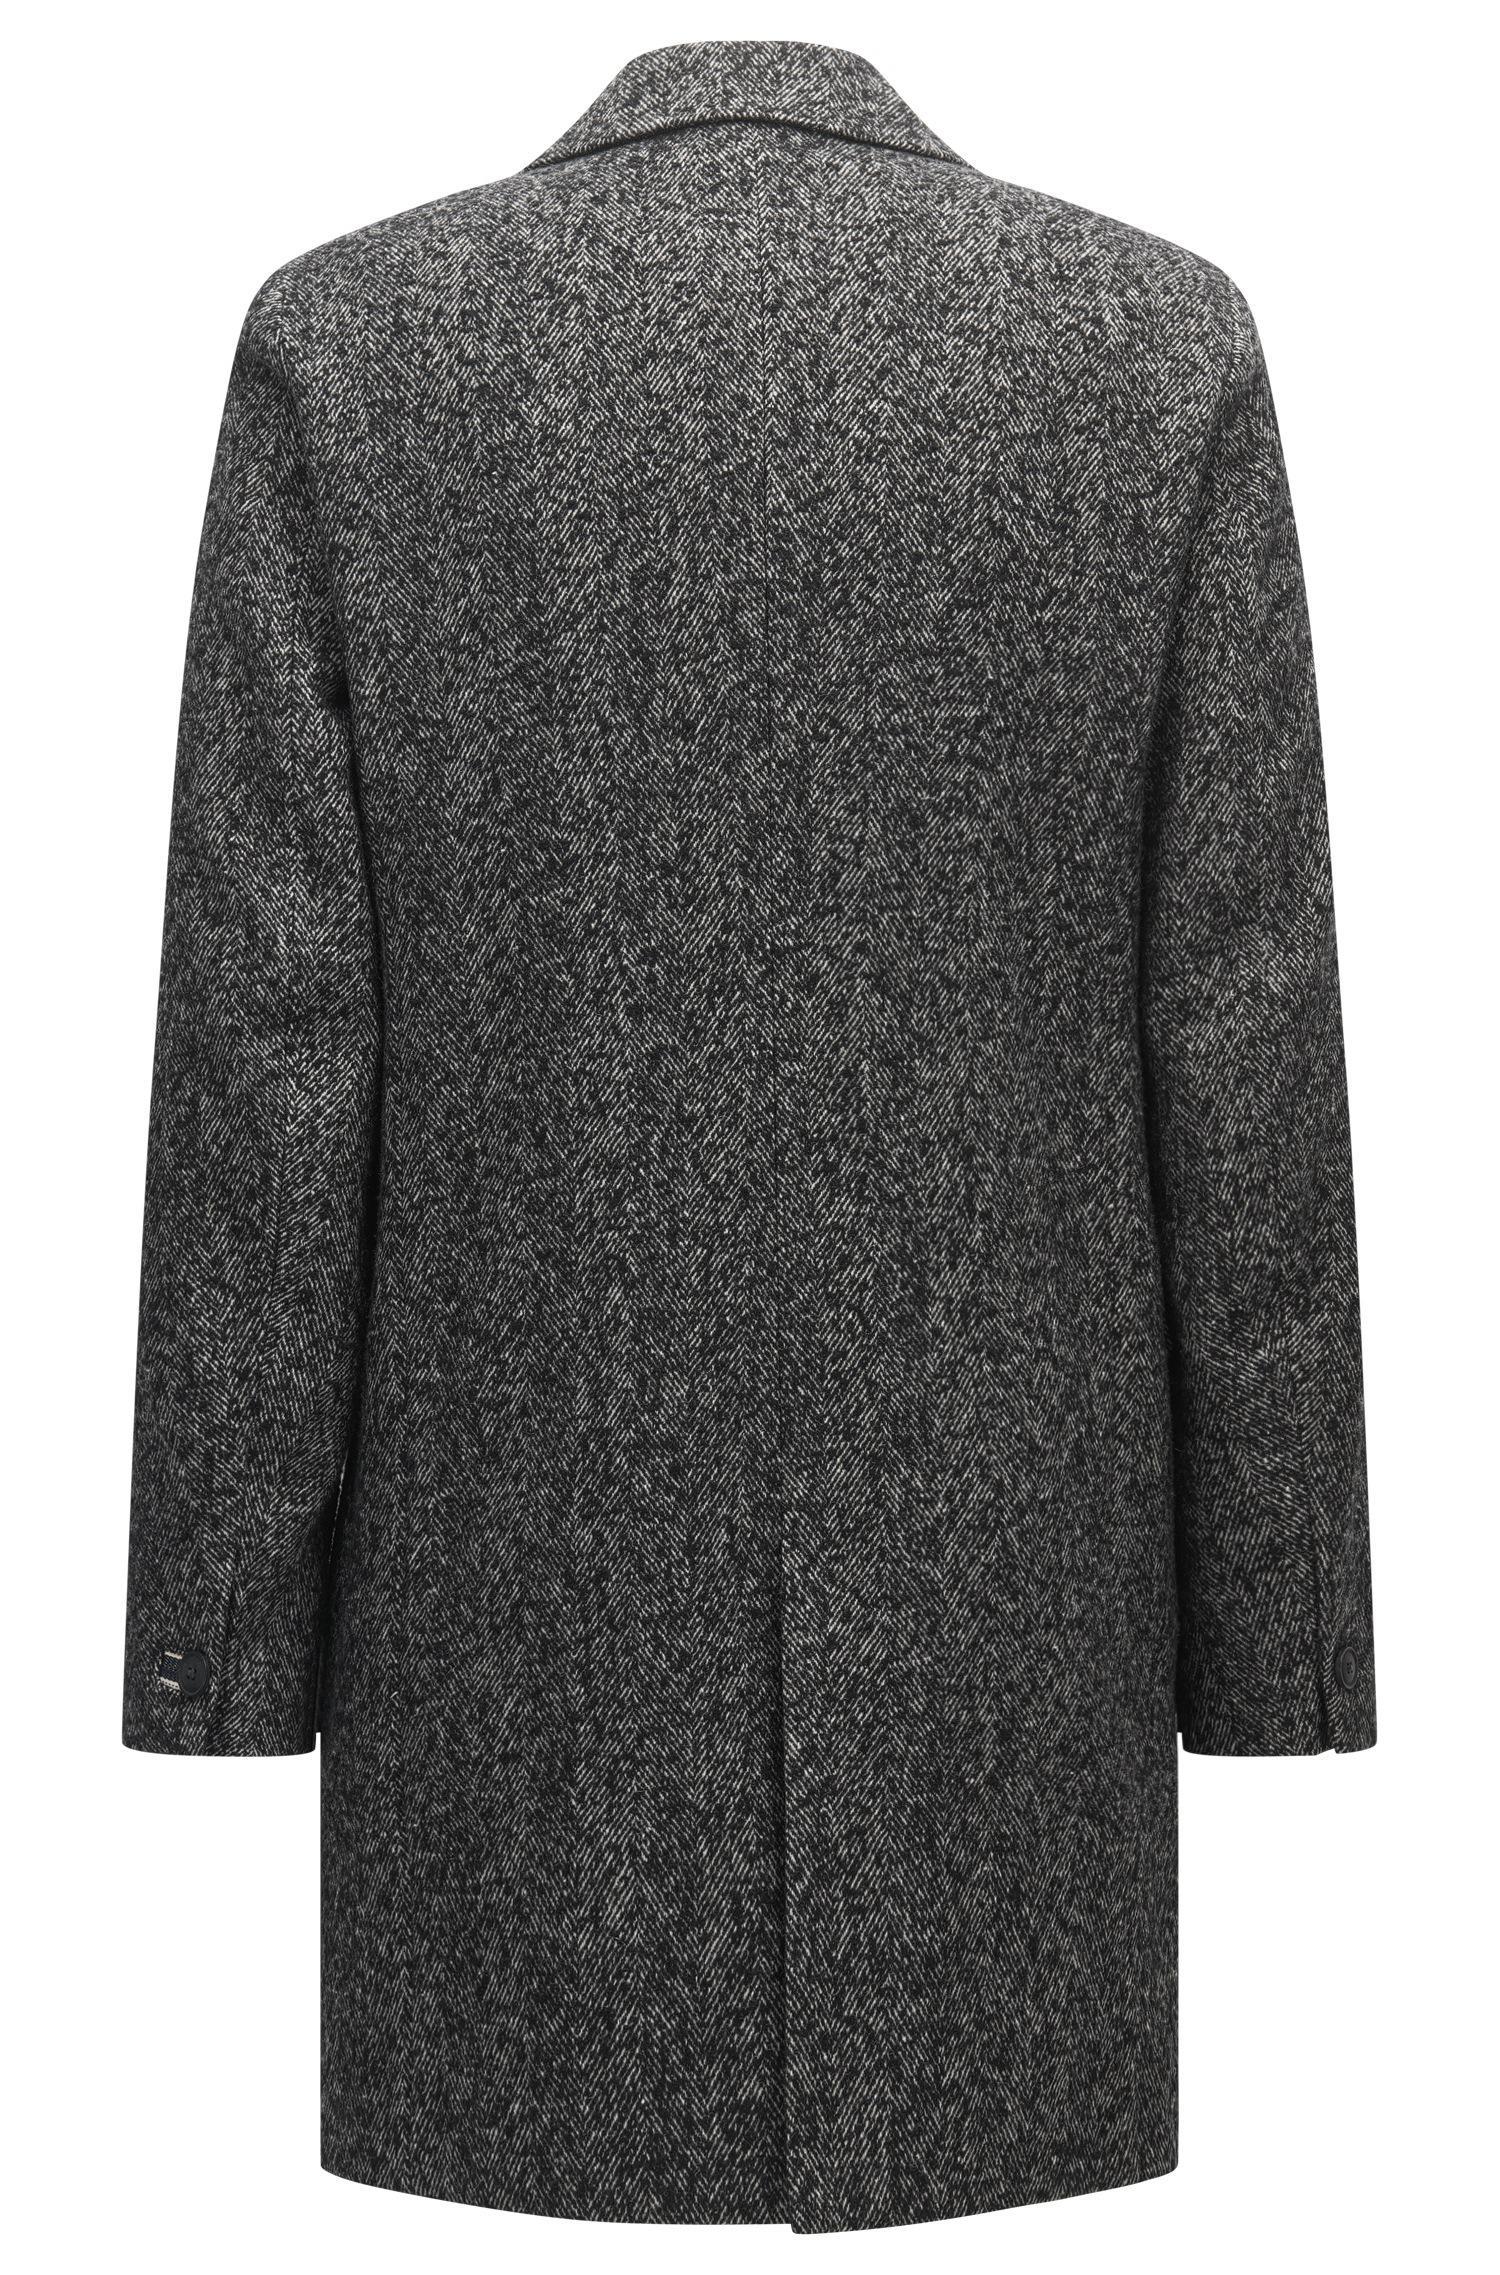 5d44b1f70129 BOSS Orange Herringbone Coat In A Slim Fit in Gray for Men - Lyst